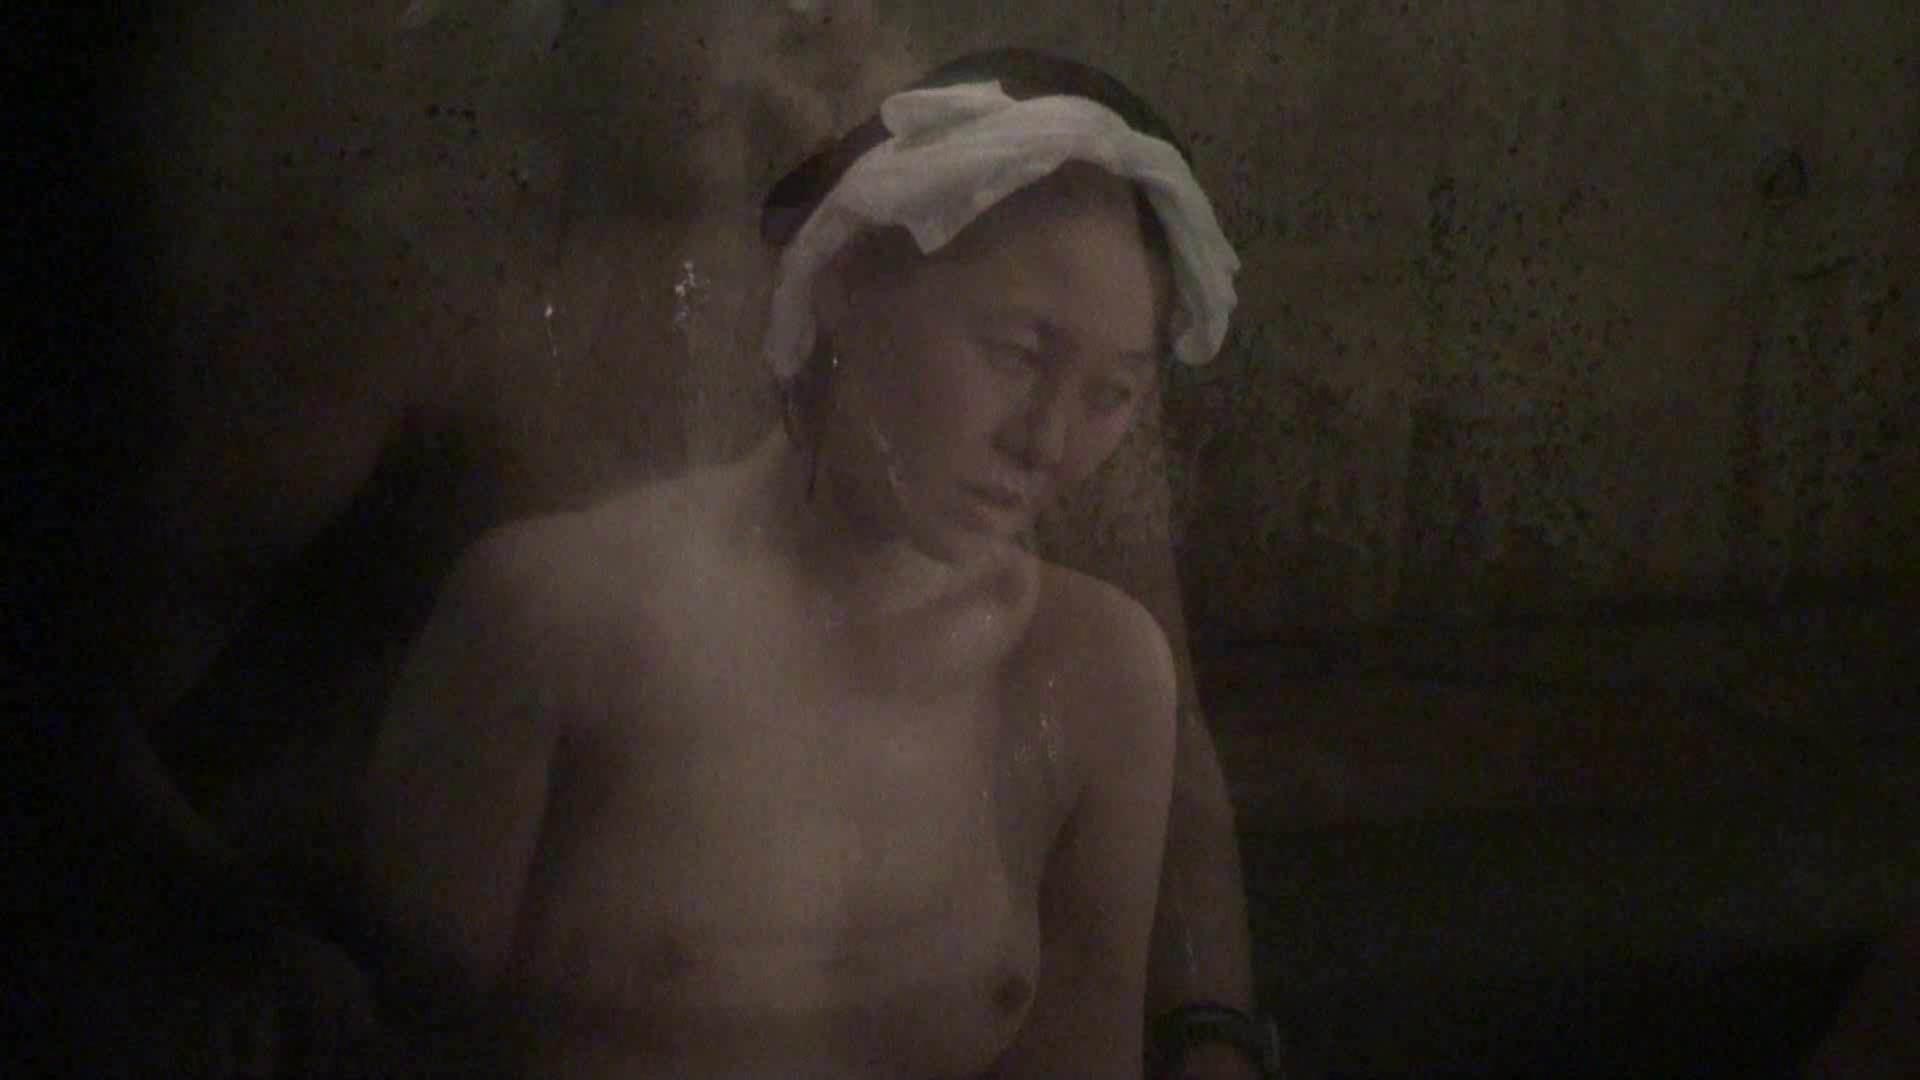 Aquaな露天風呂Vol.322 OL女体  108連発 99